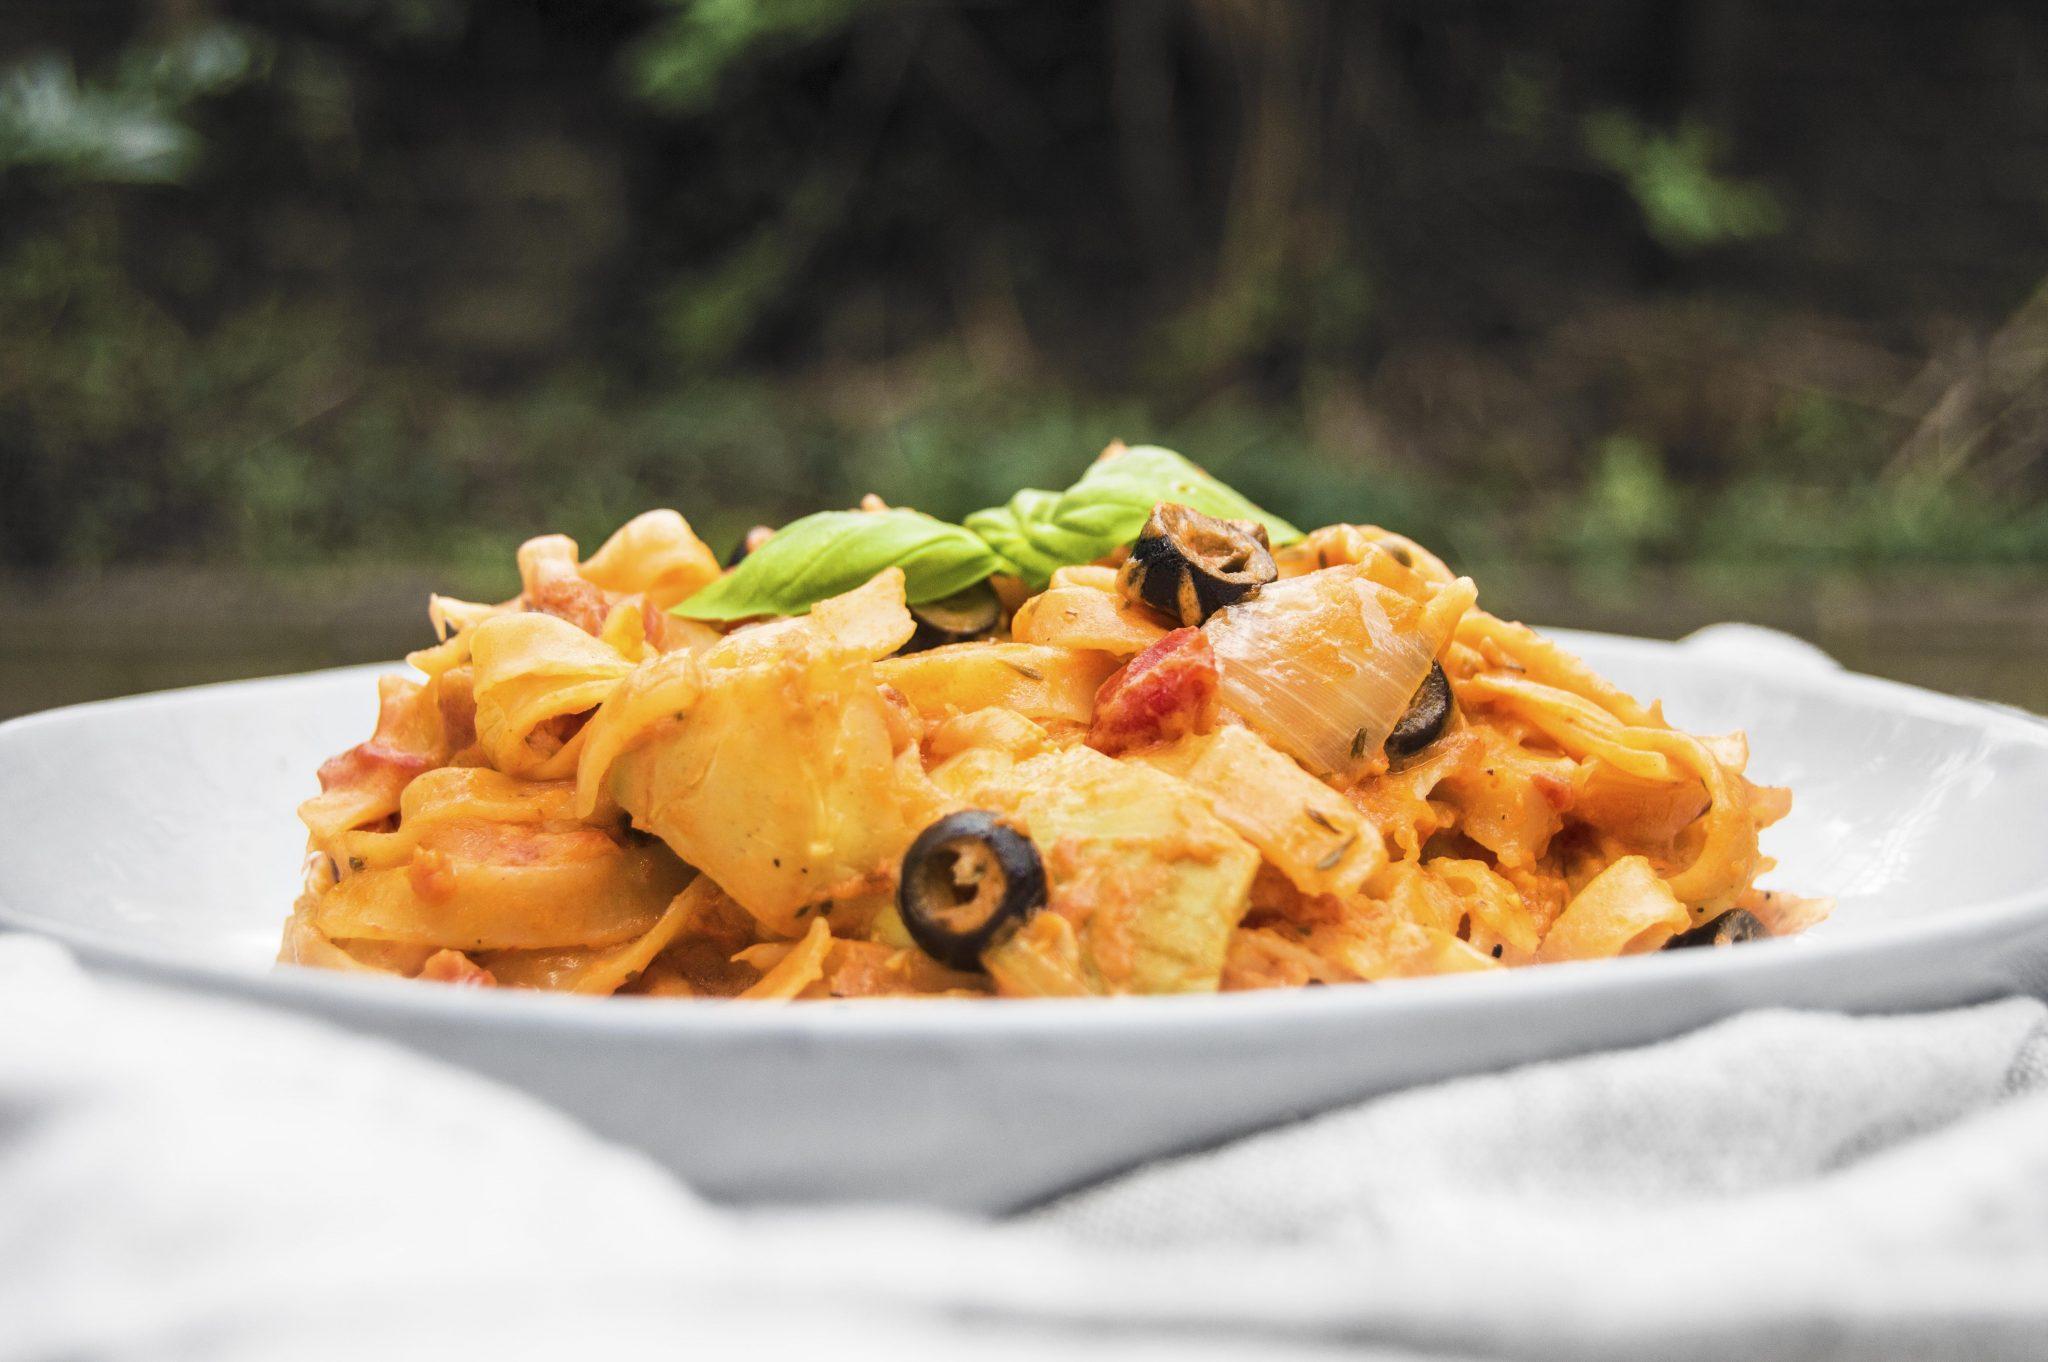 Vegan Creamy Tomato Mediterranean One Pot Pasta